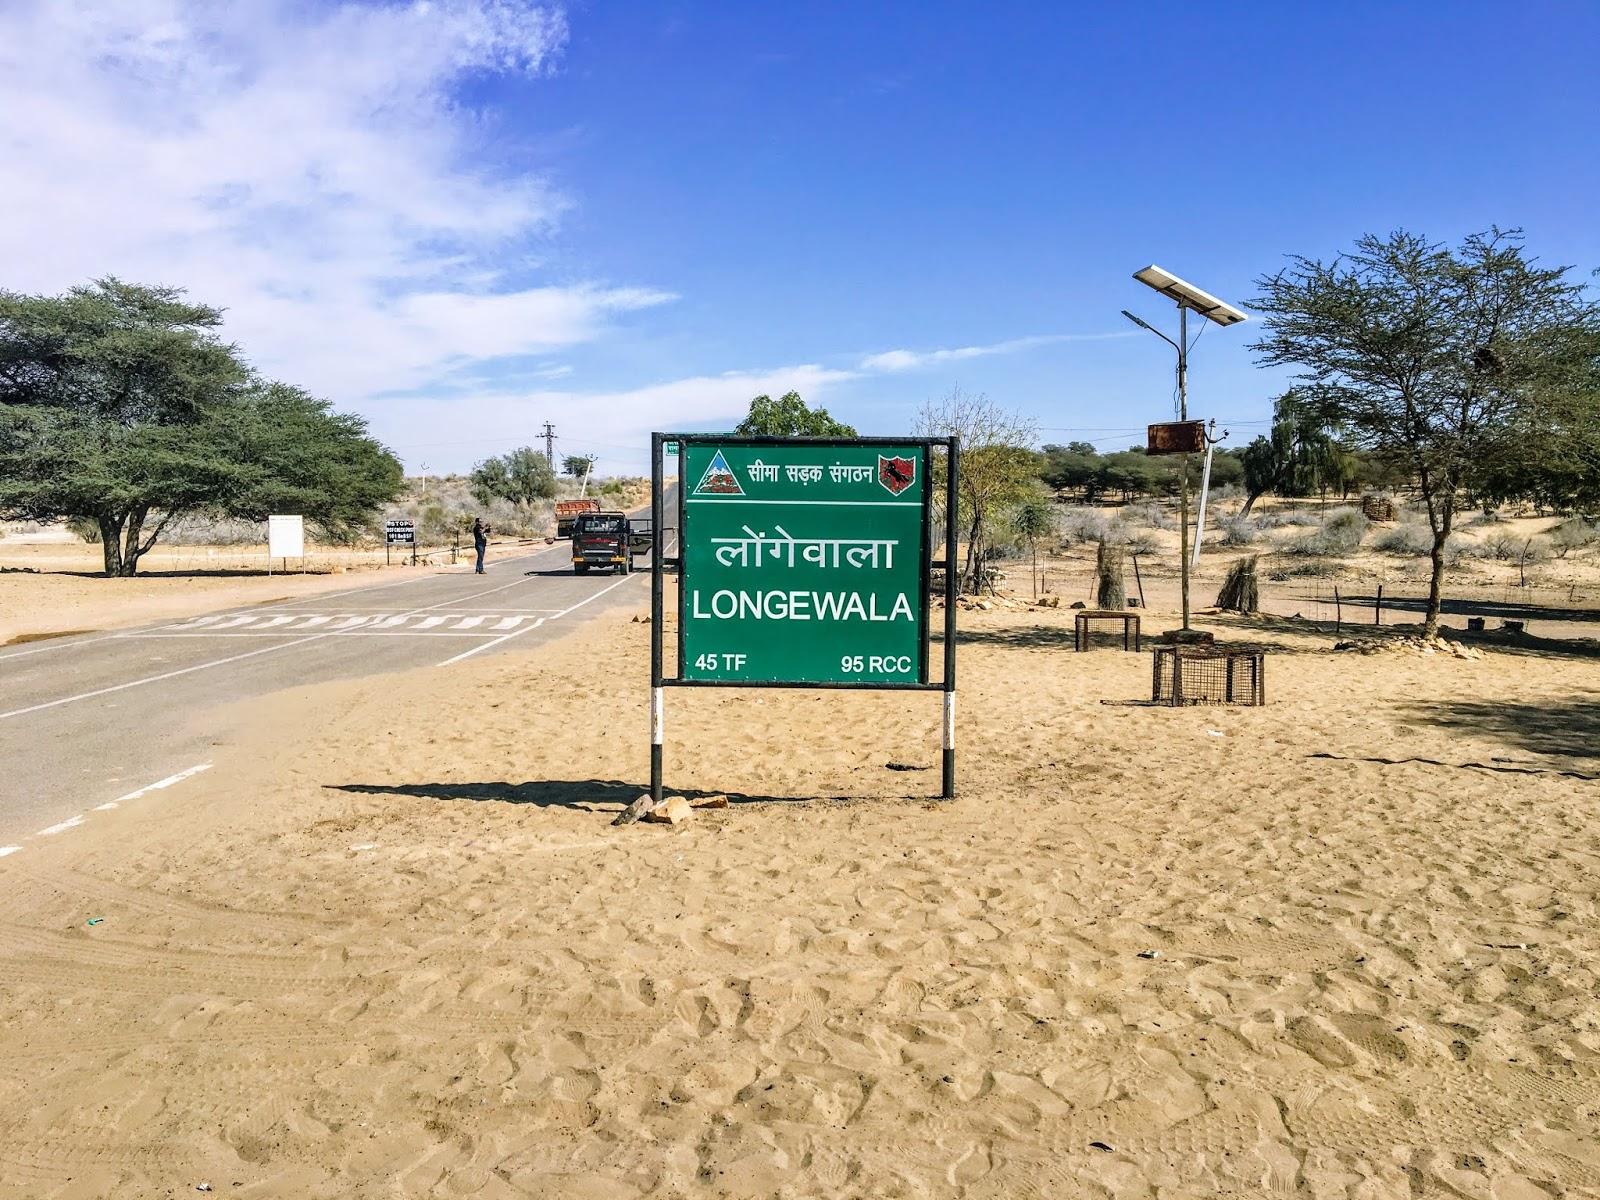 Longewala, Rajasthan